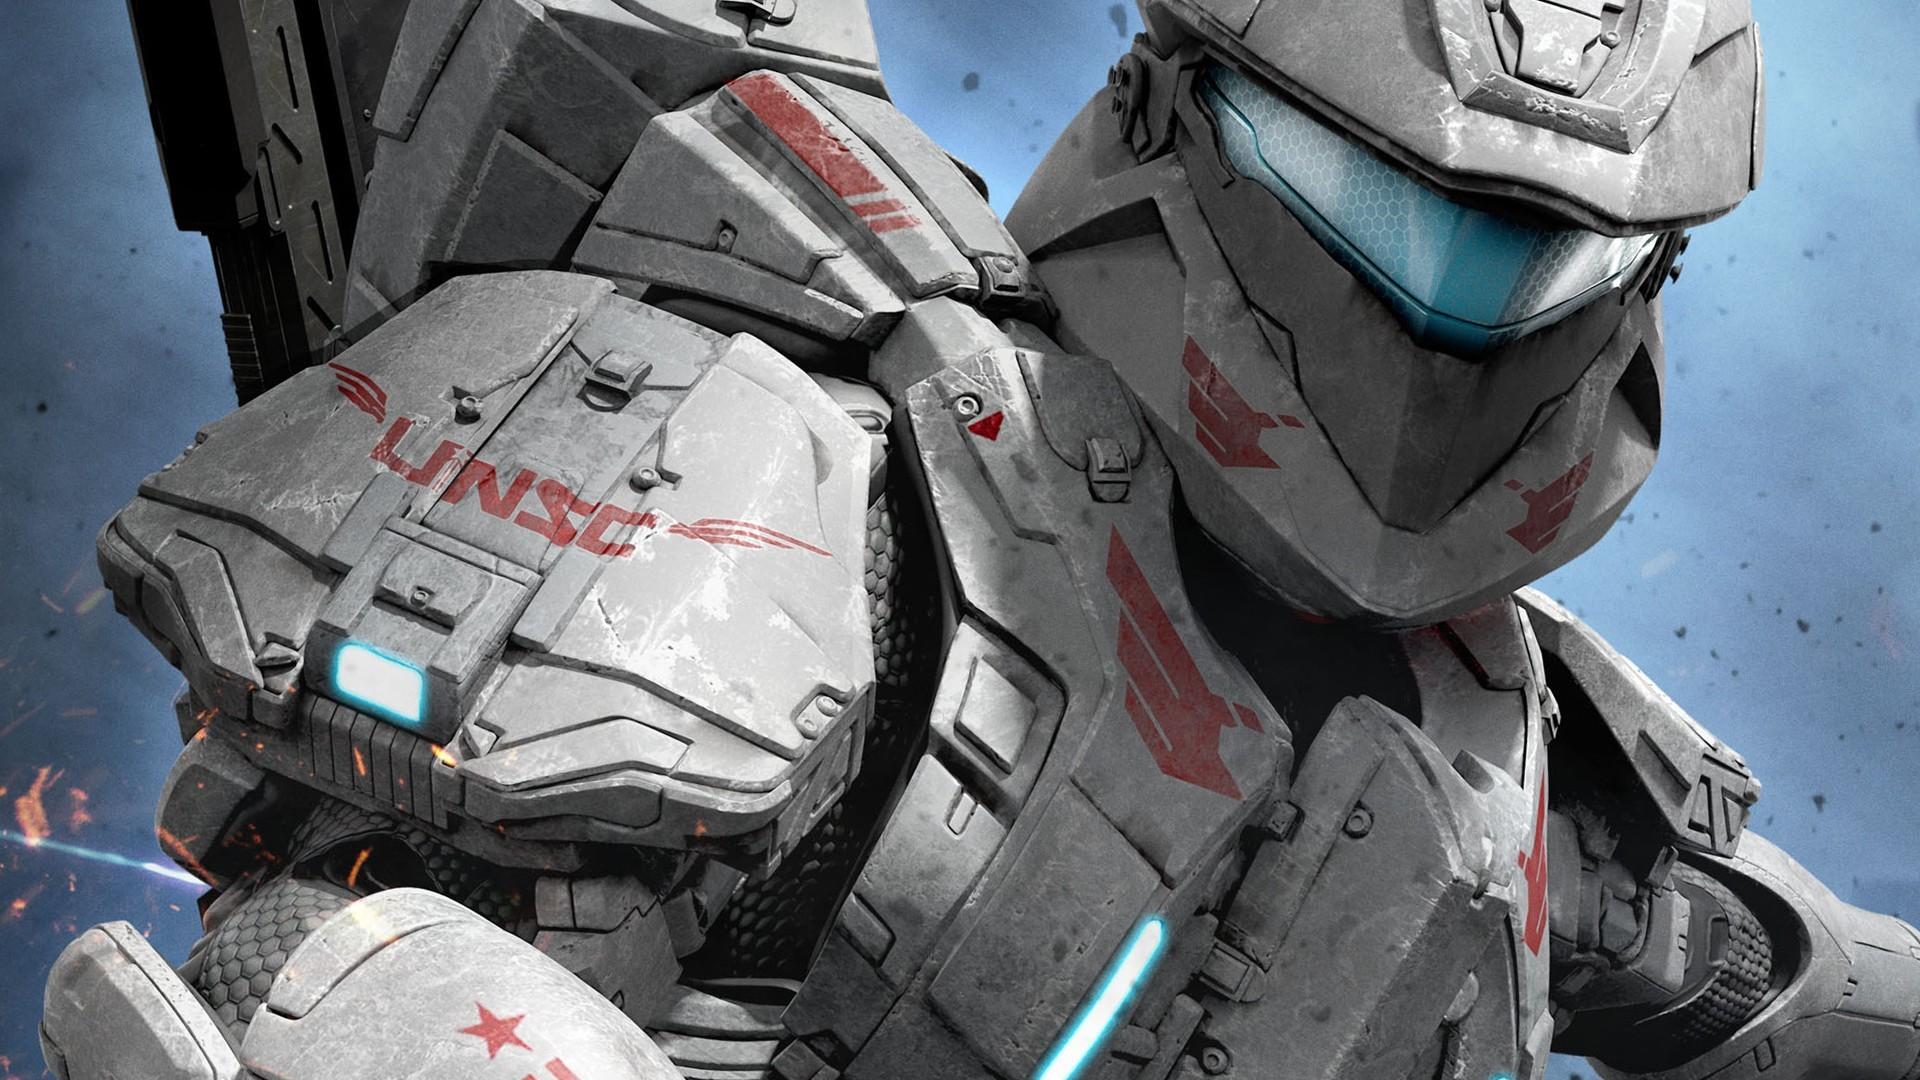 Res: 1920x1080, Halo: Spartan Assault HD Wallpaper 12 - 1920 X 1080